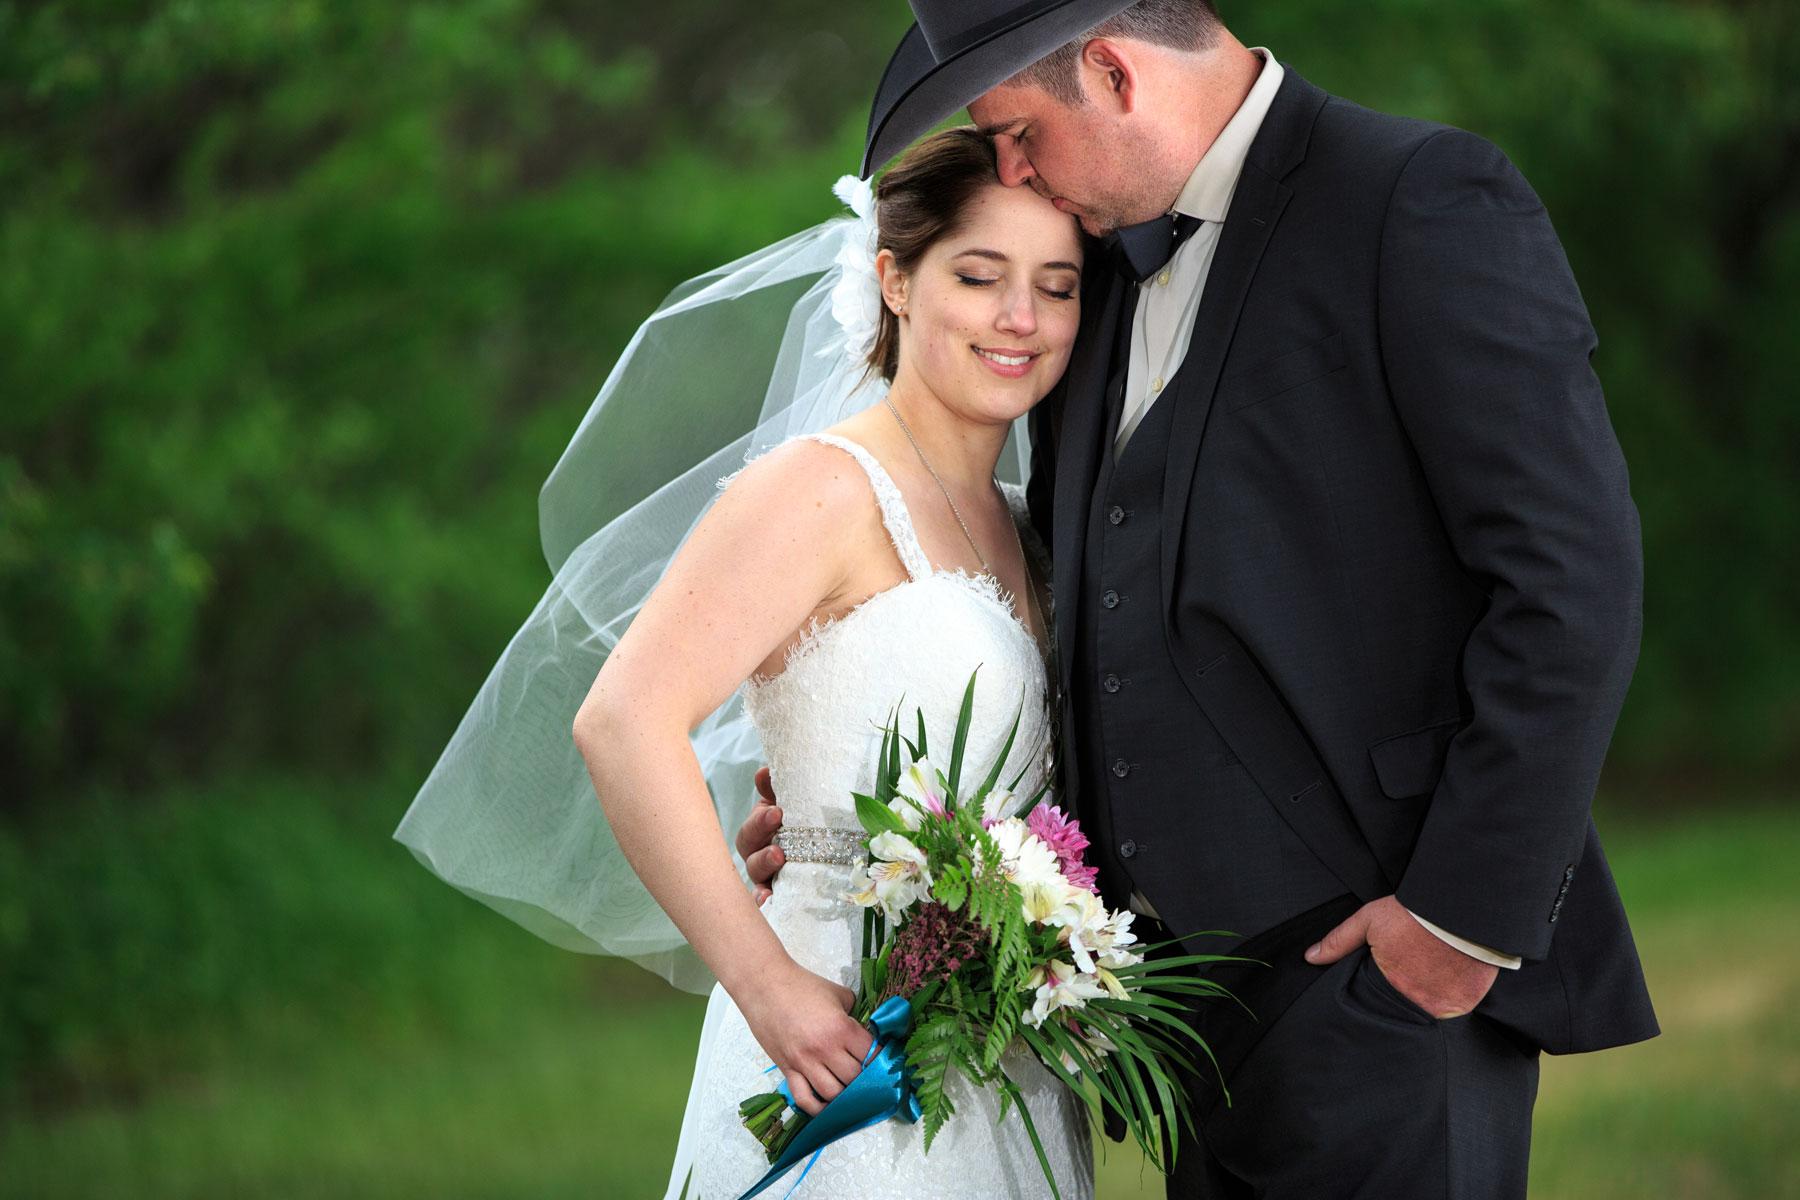 Angela & Patrick - Lacombe, Alberta Wedding Photography - Olson Studios (21)